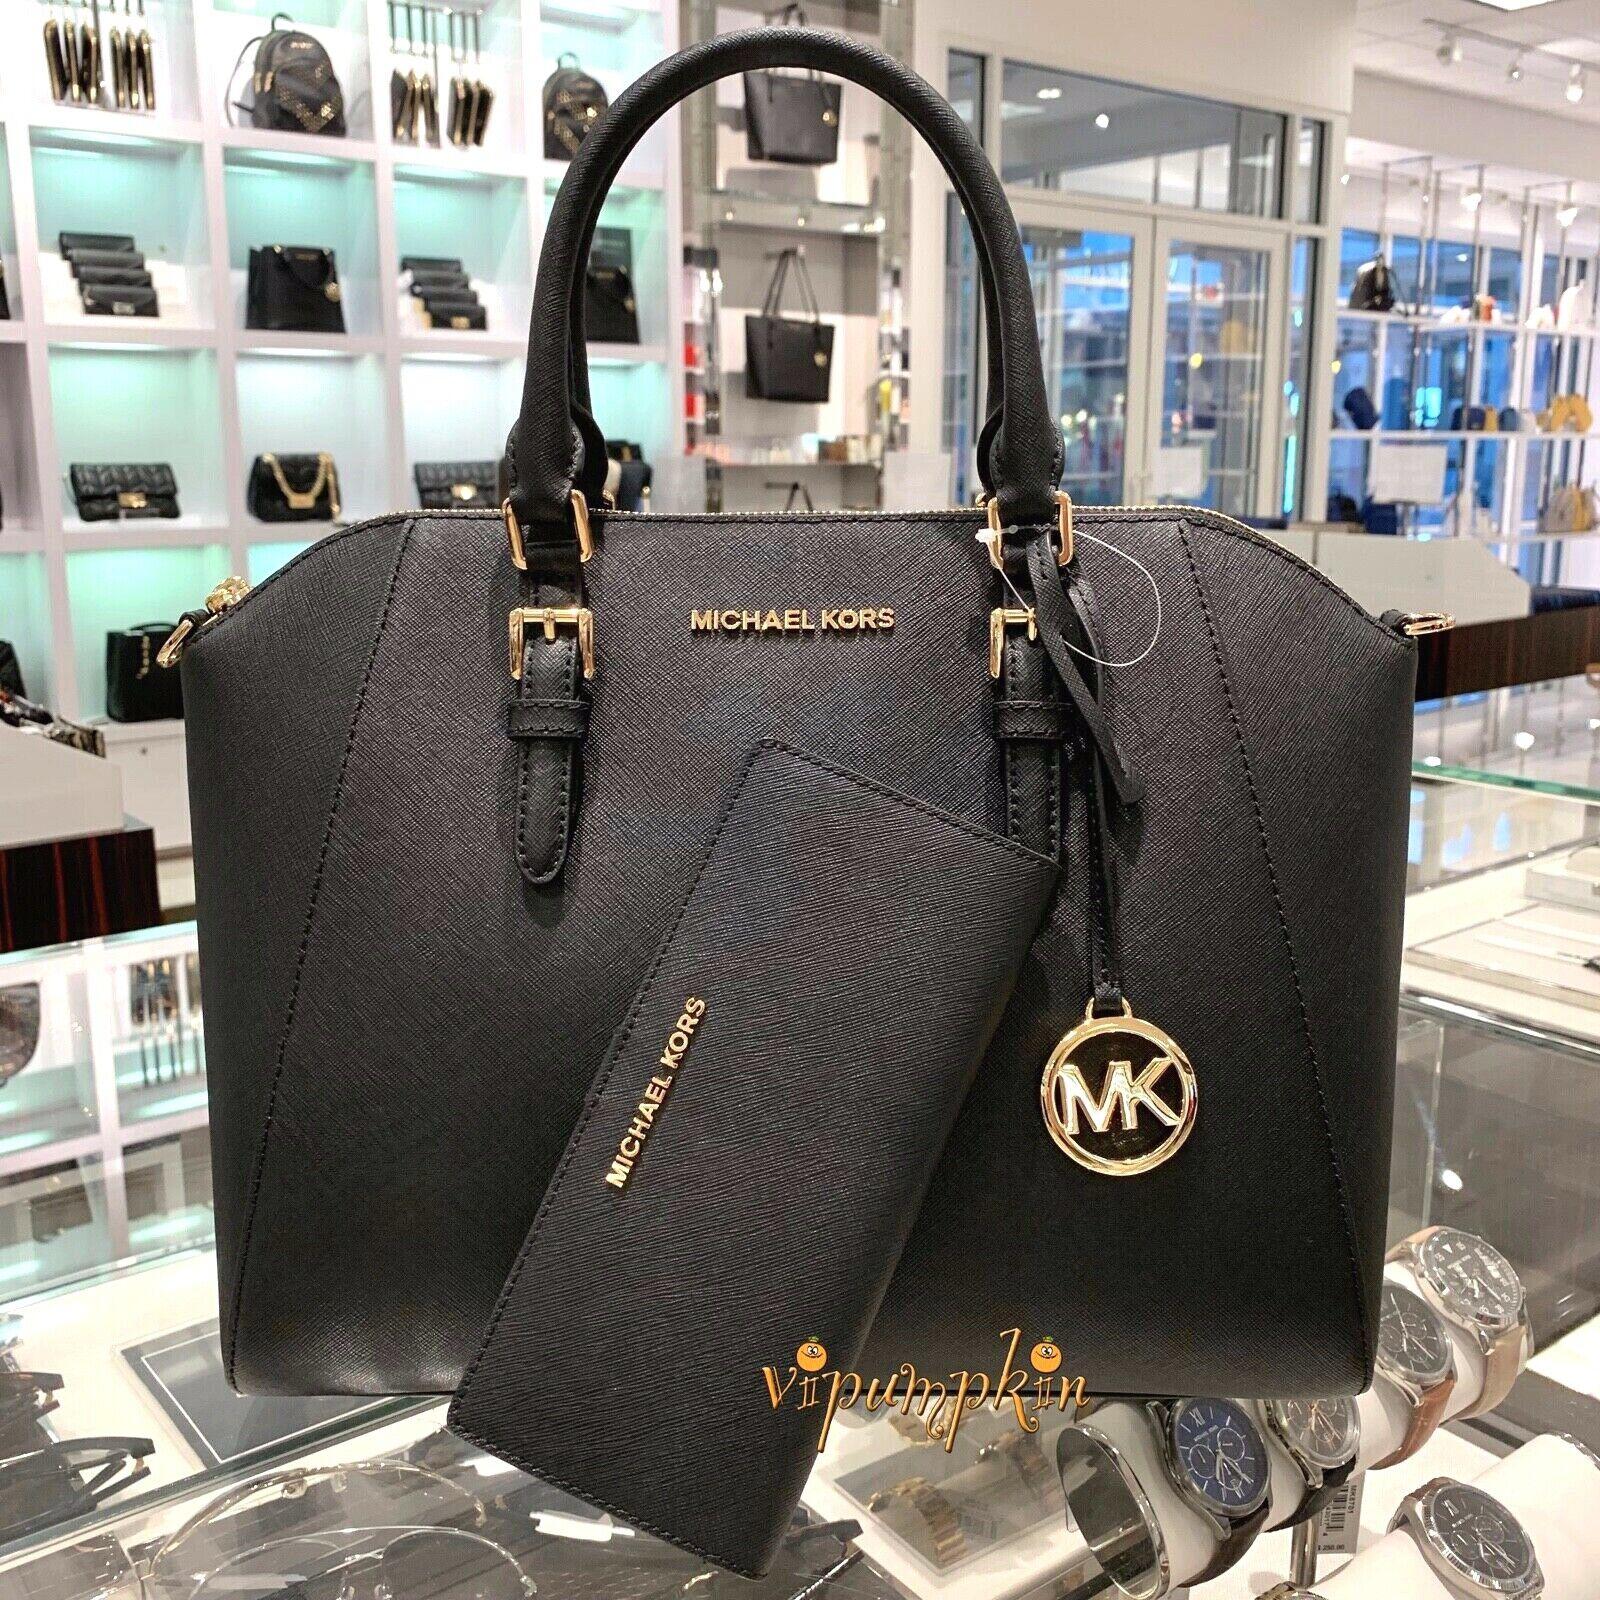 Michael Kors Ciara Large Satchel Saffiano Leather Bag Black